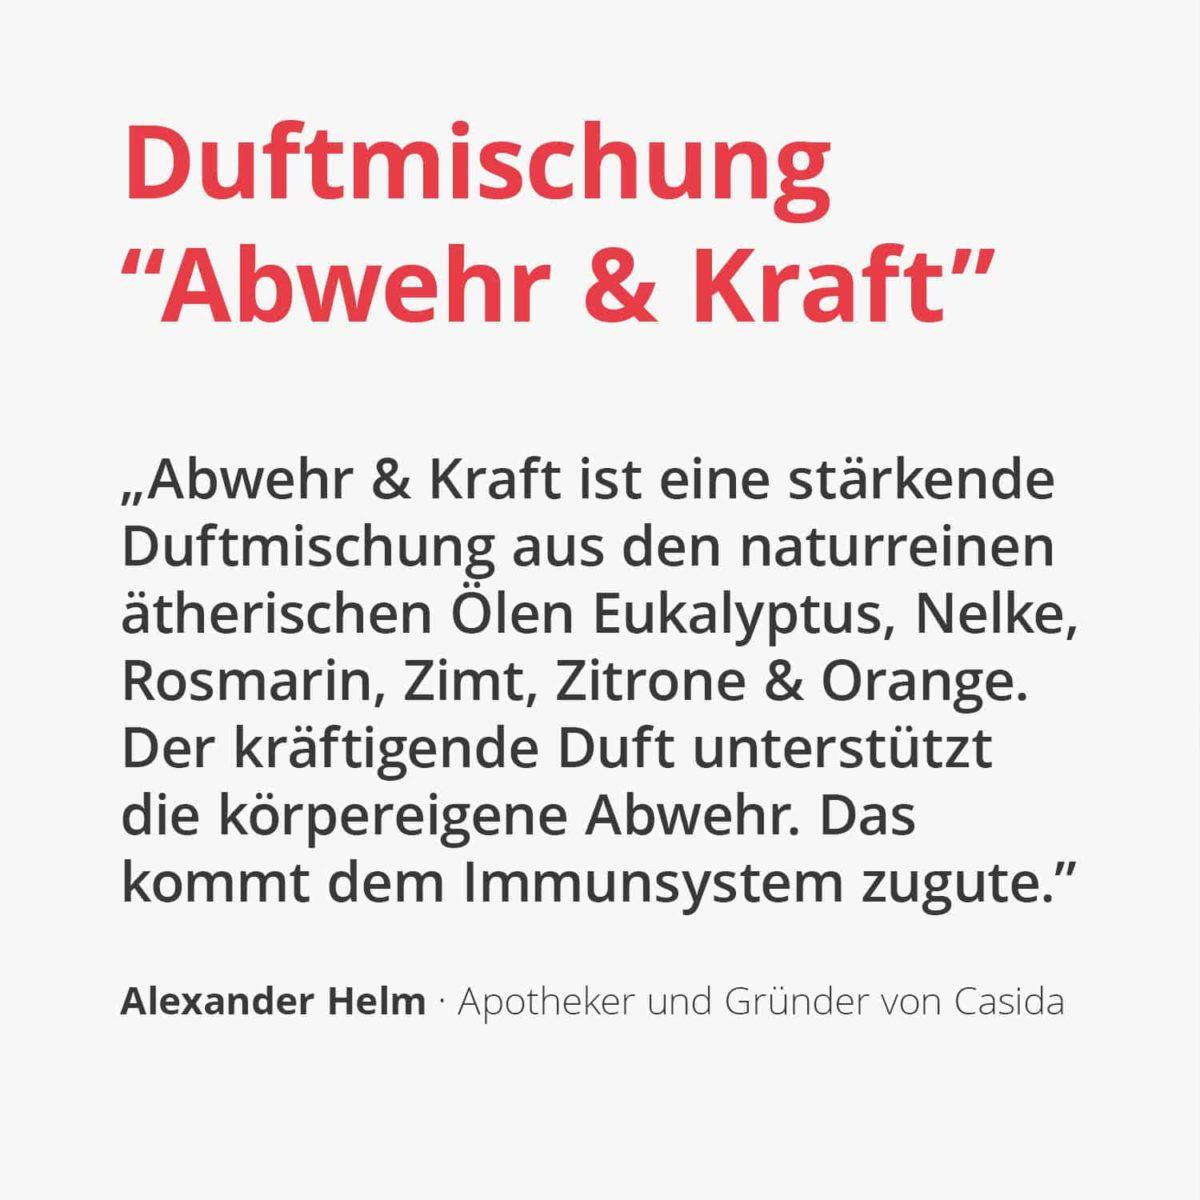 Casida Duftmischung Abwehr & Kraft - 5 ml 16913323 PZN Apotheke Immunsystem stärkend Aromatherapie Aromapflege Corona Grippe Abwehrkräfte Diffuser